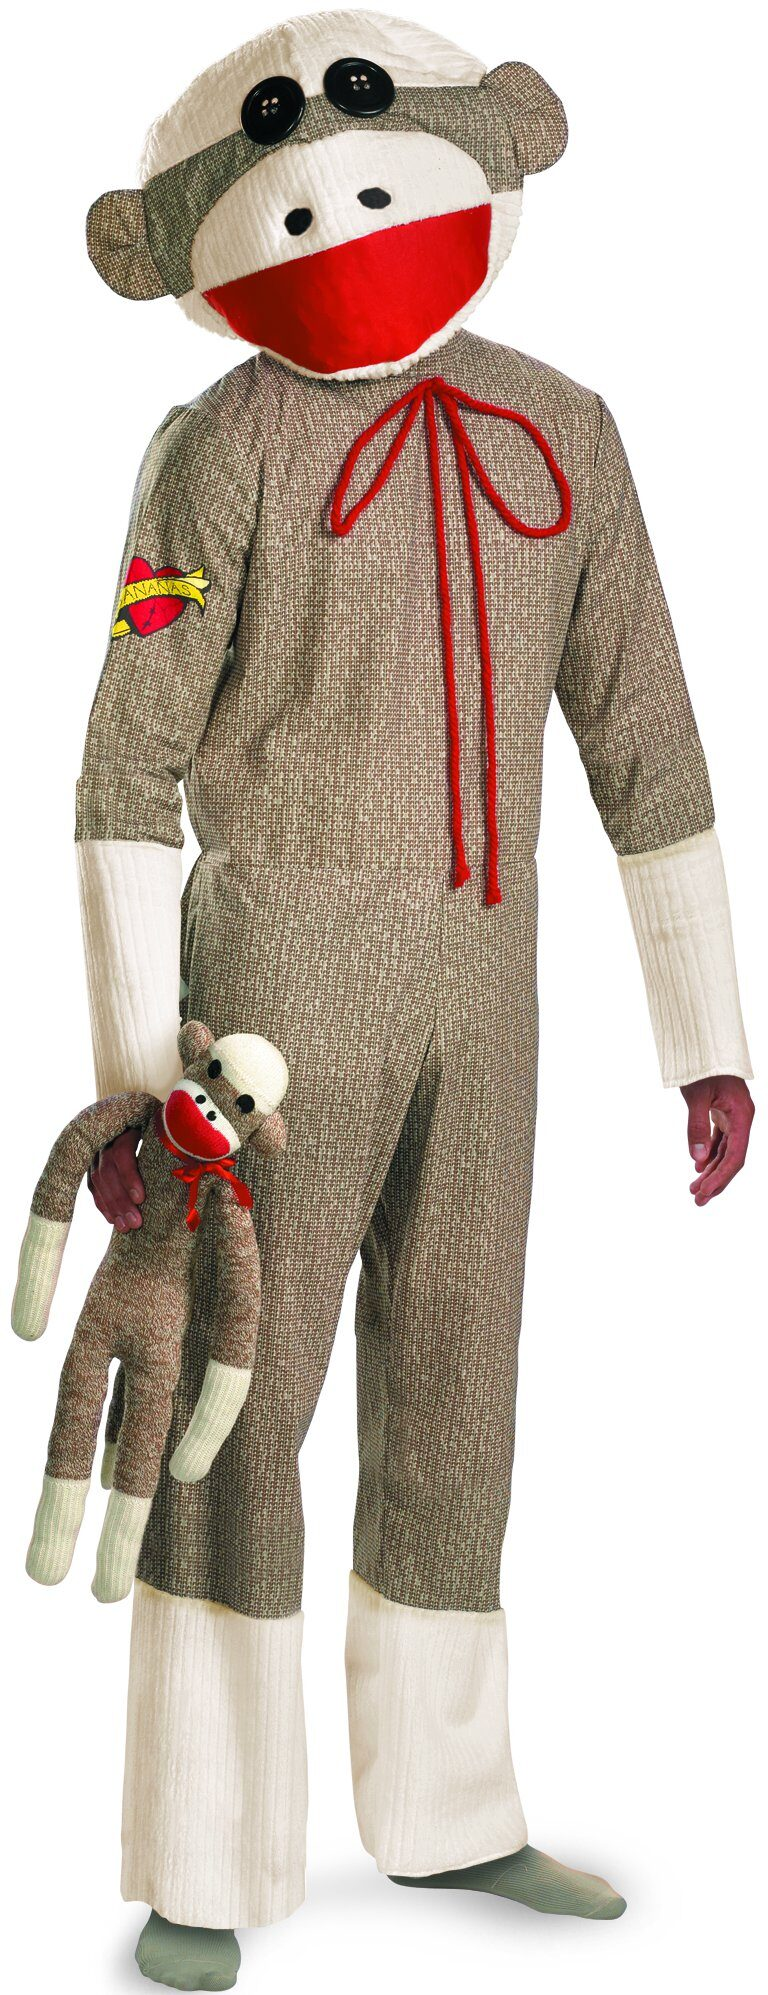 Sock Monkey Adult Costume - Mr. Costumes